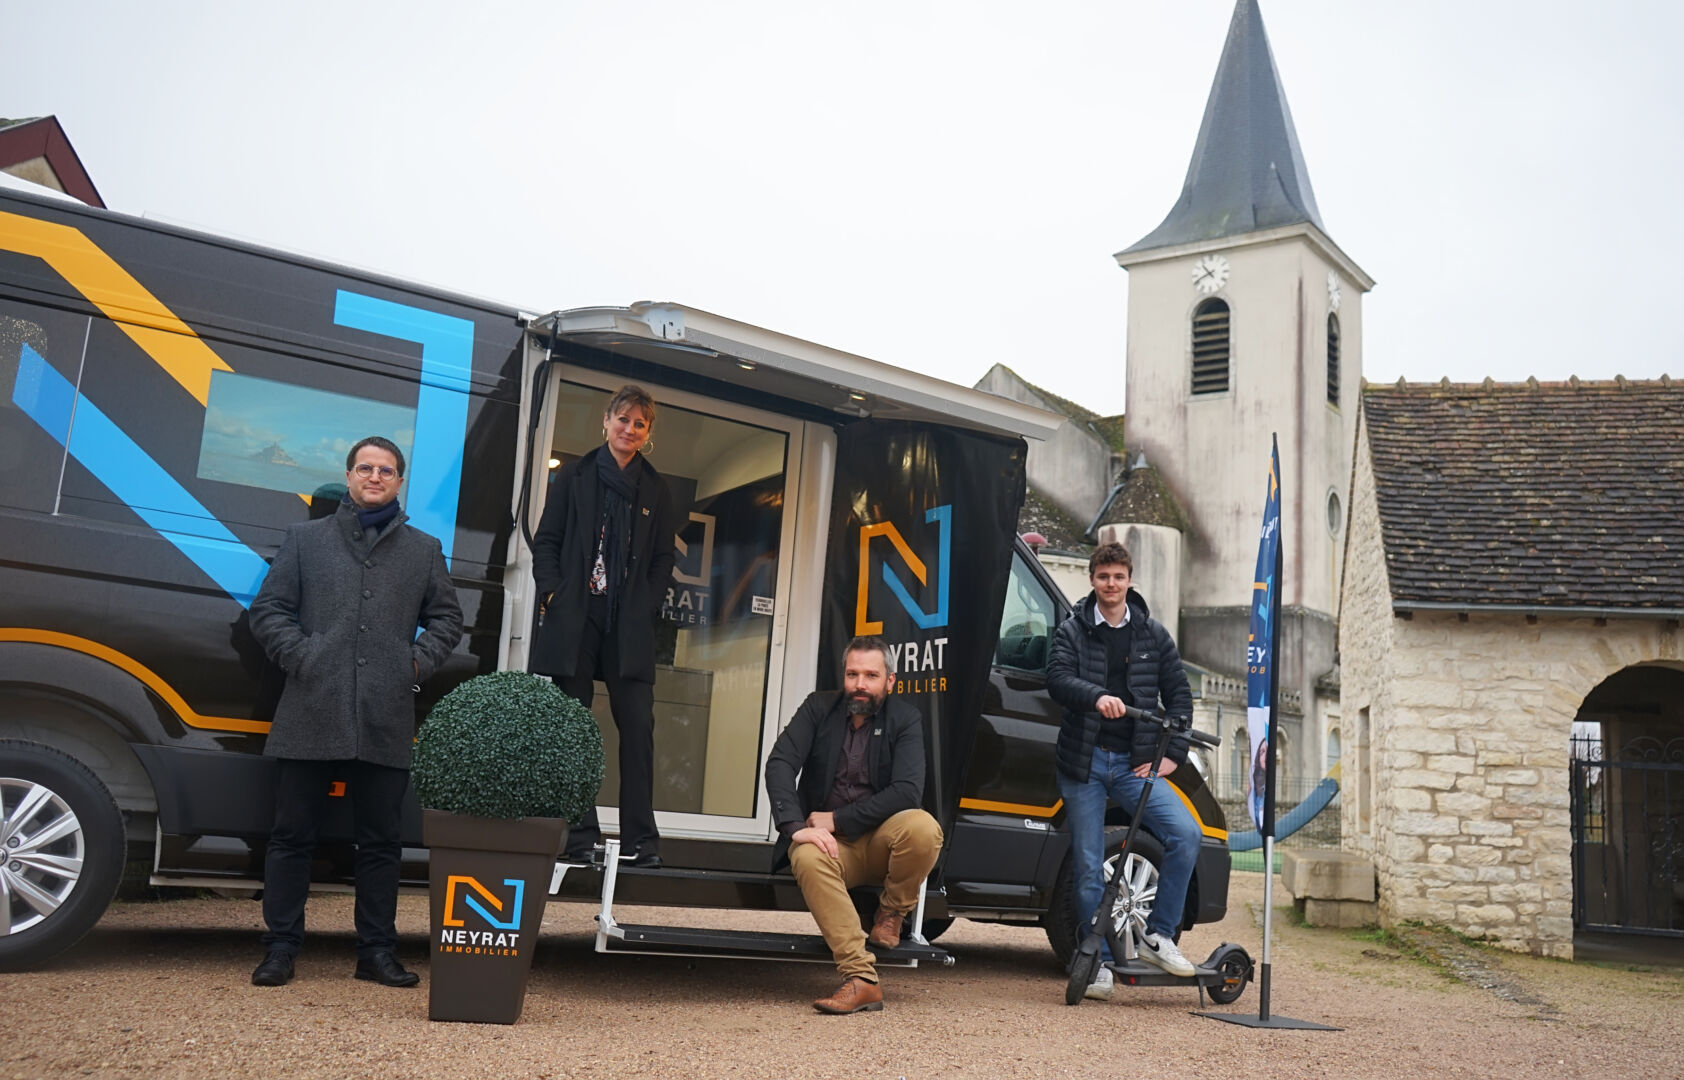 Immo-truck, l'agence ambulante de Neyrat Immobilier qui sillonne la campagne de Bourgogne